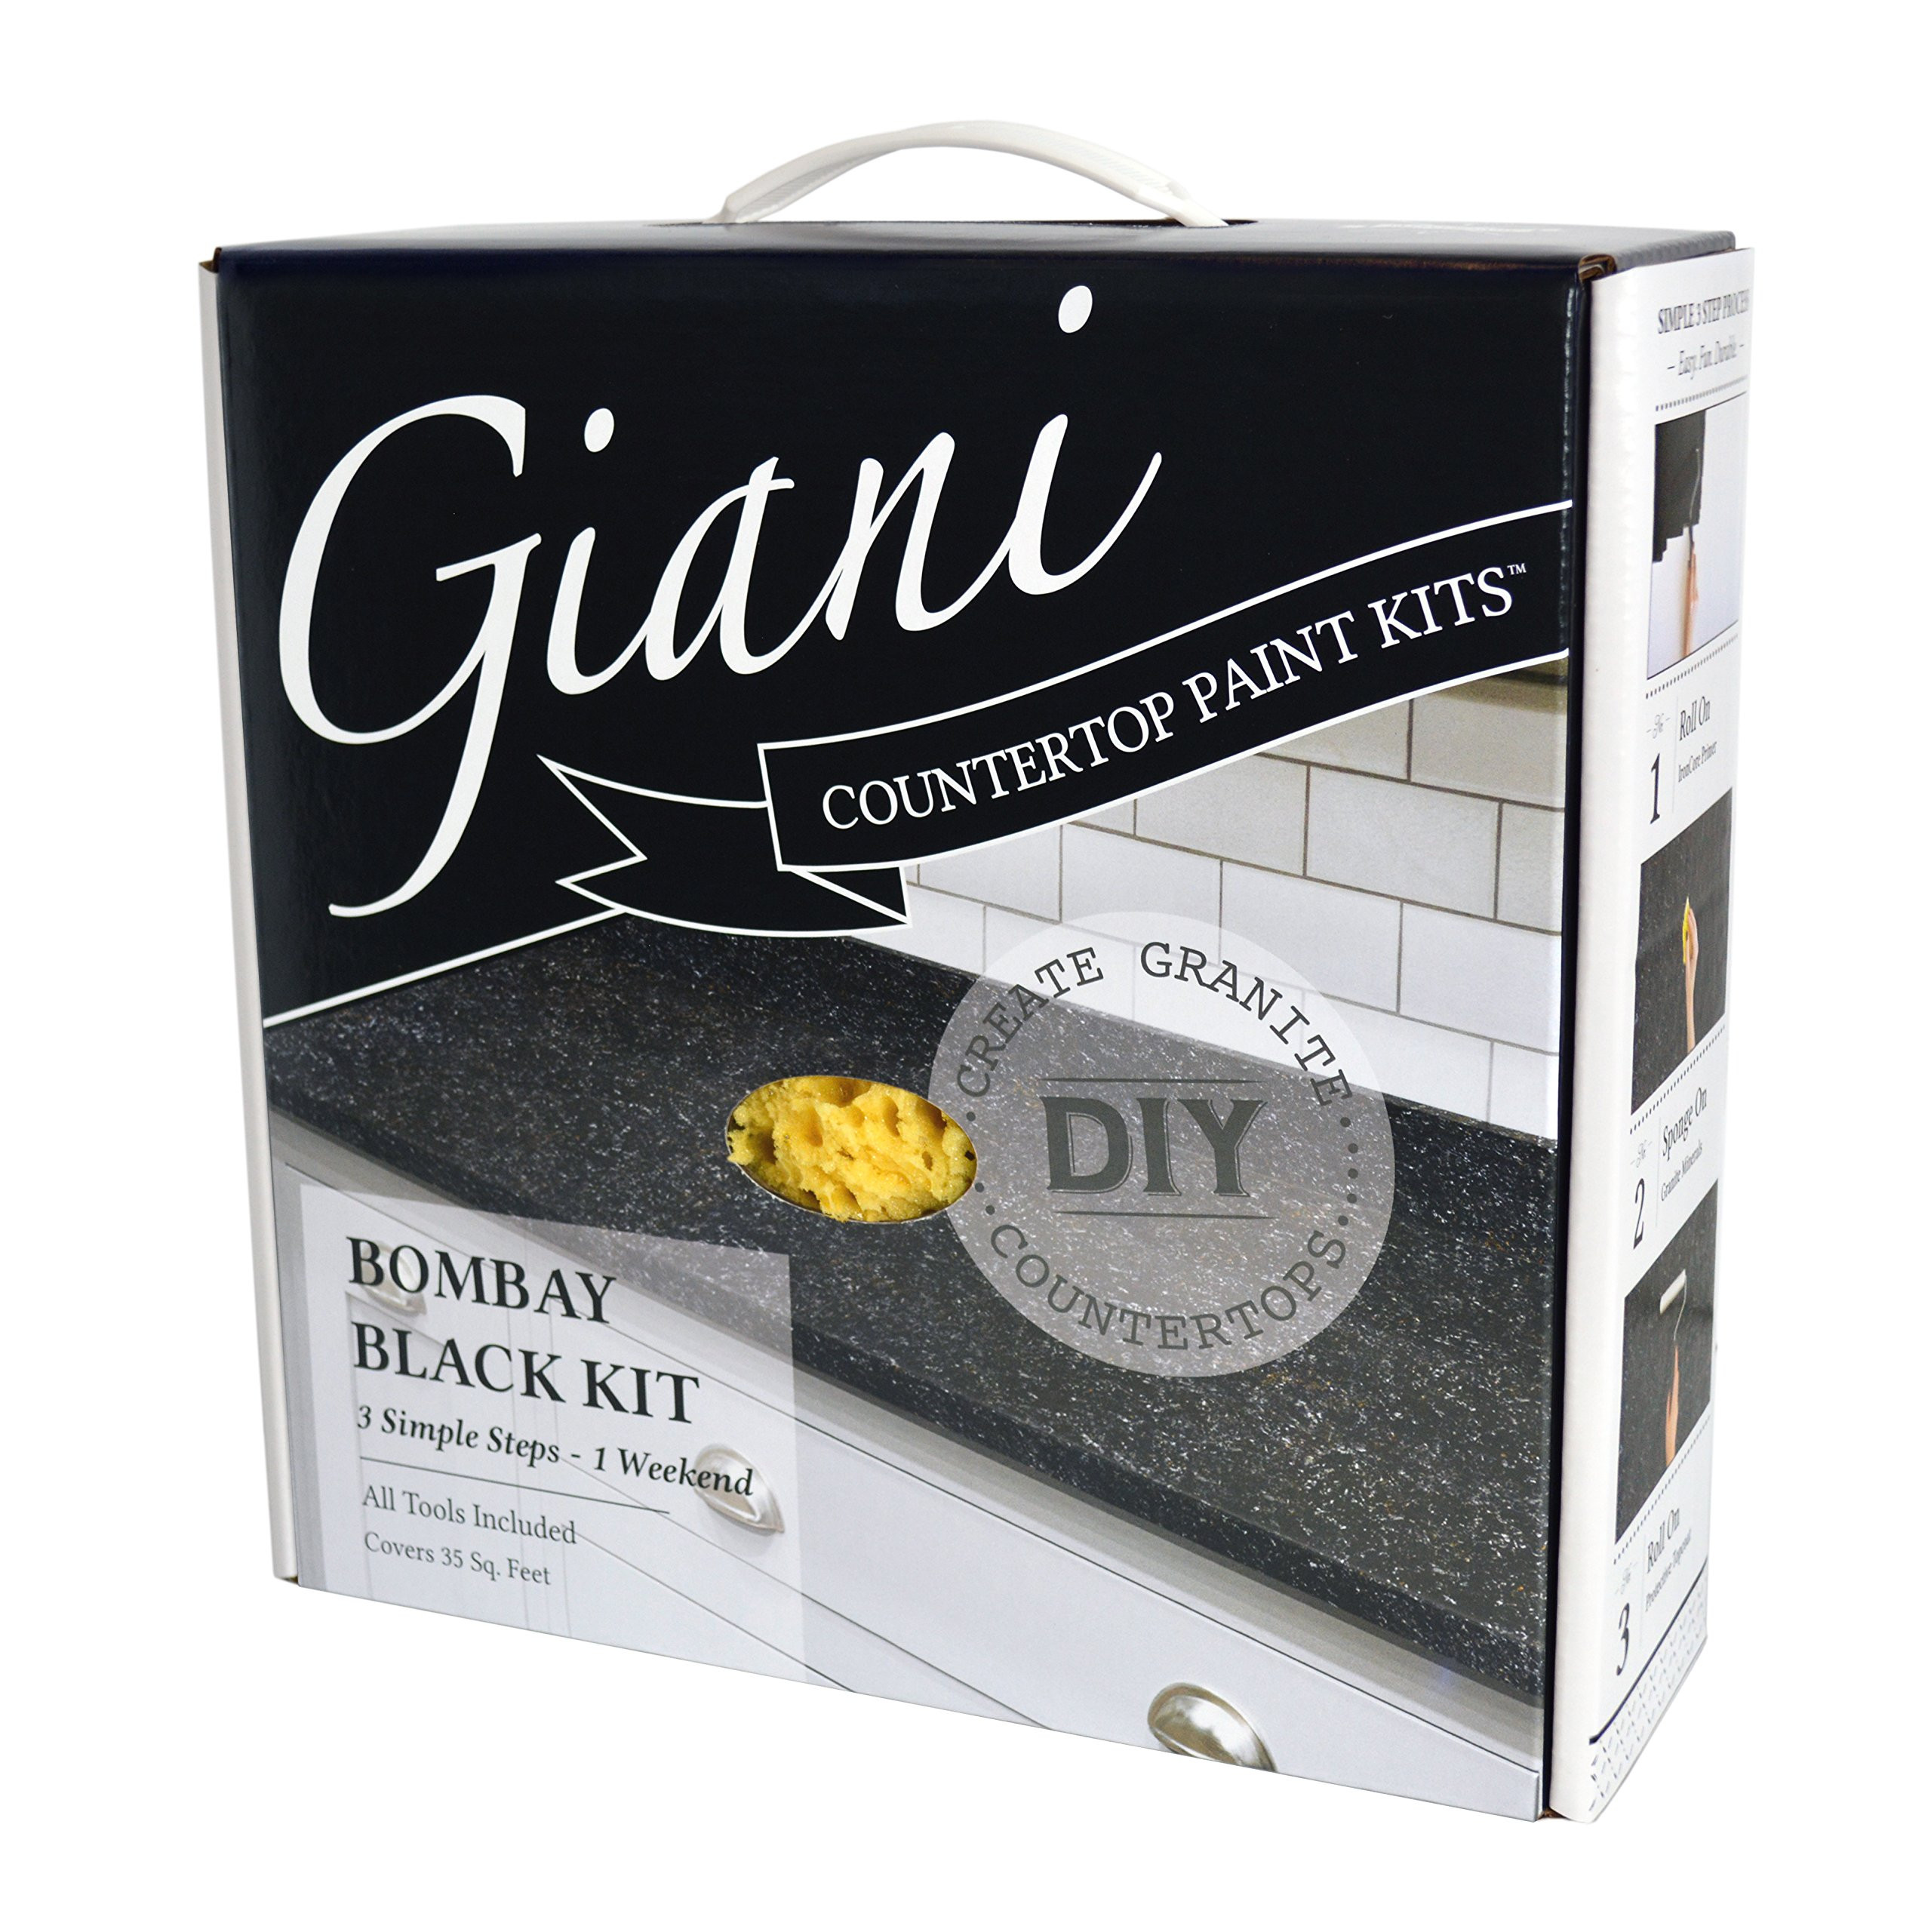 Giani Countertop Paint Kit, Bombay Black